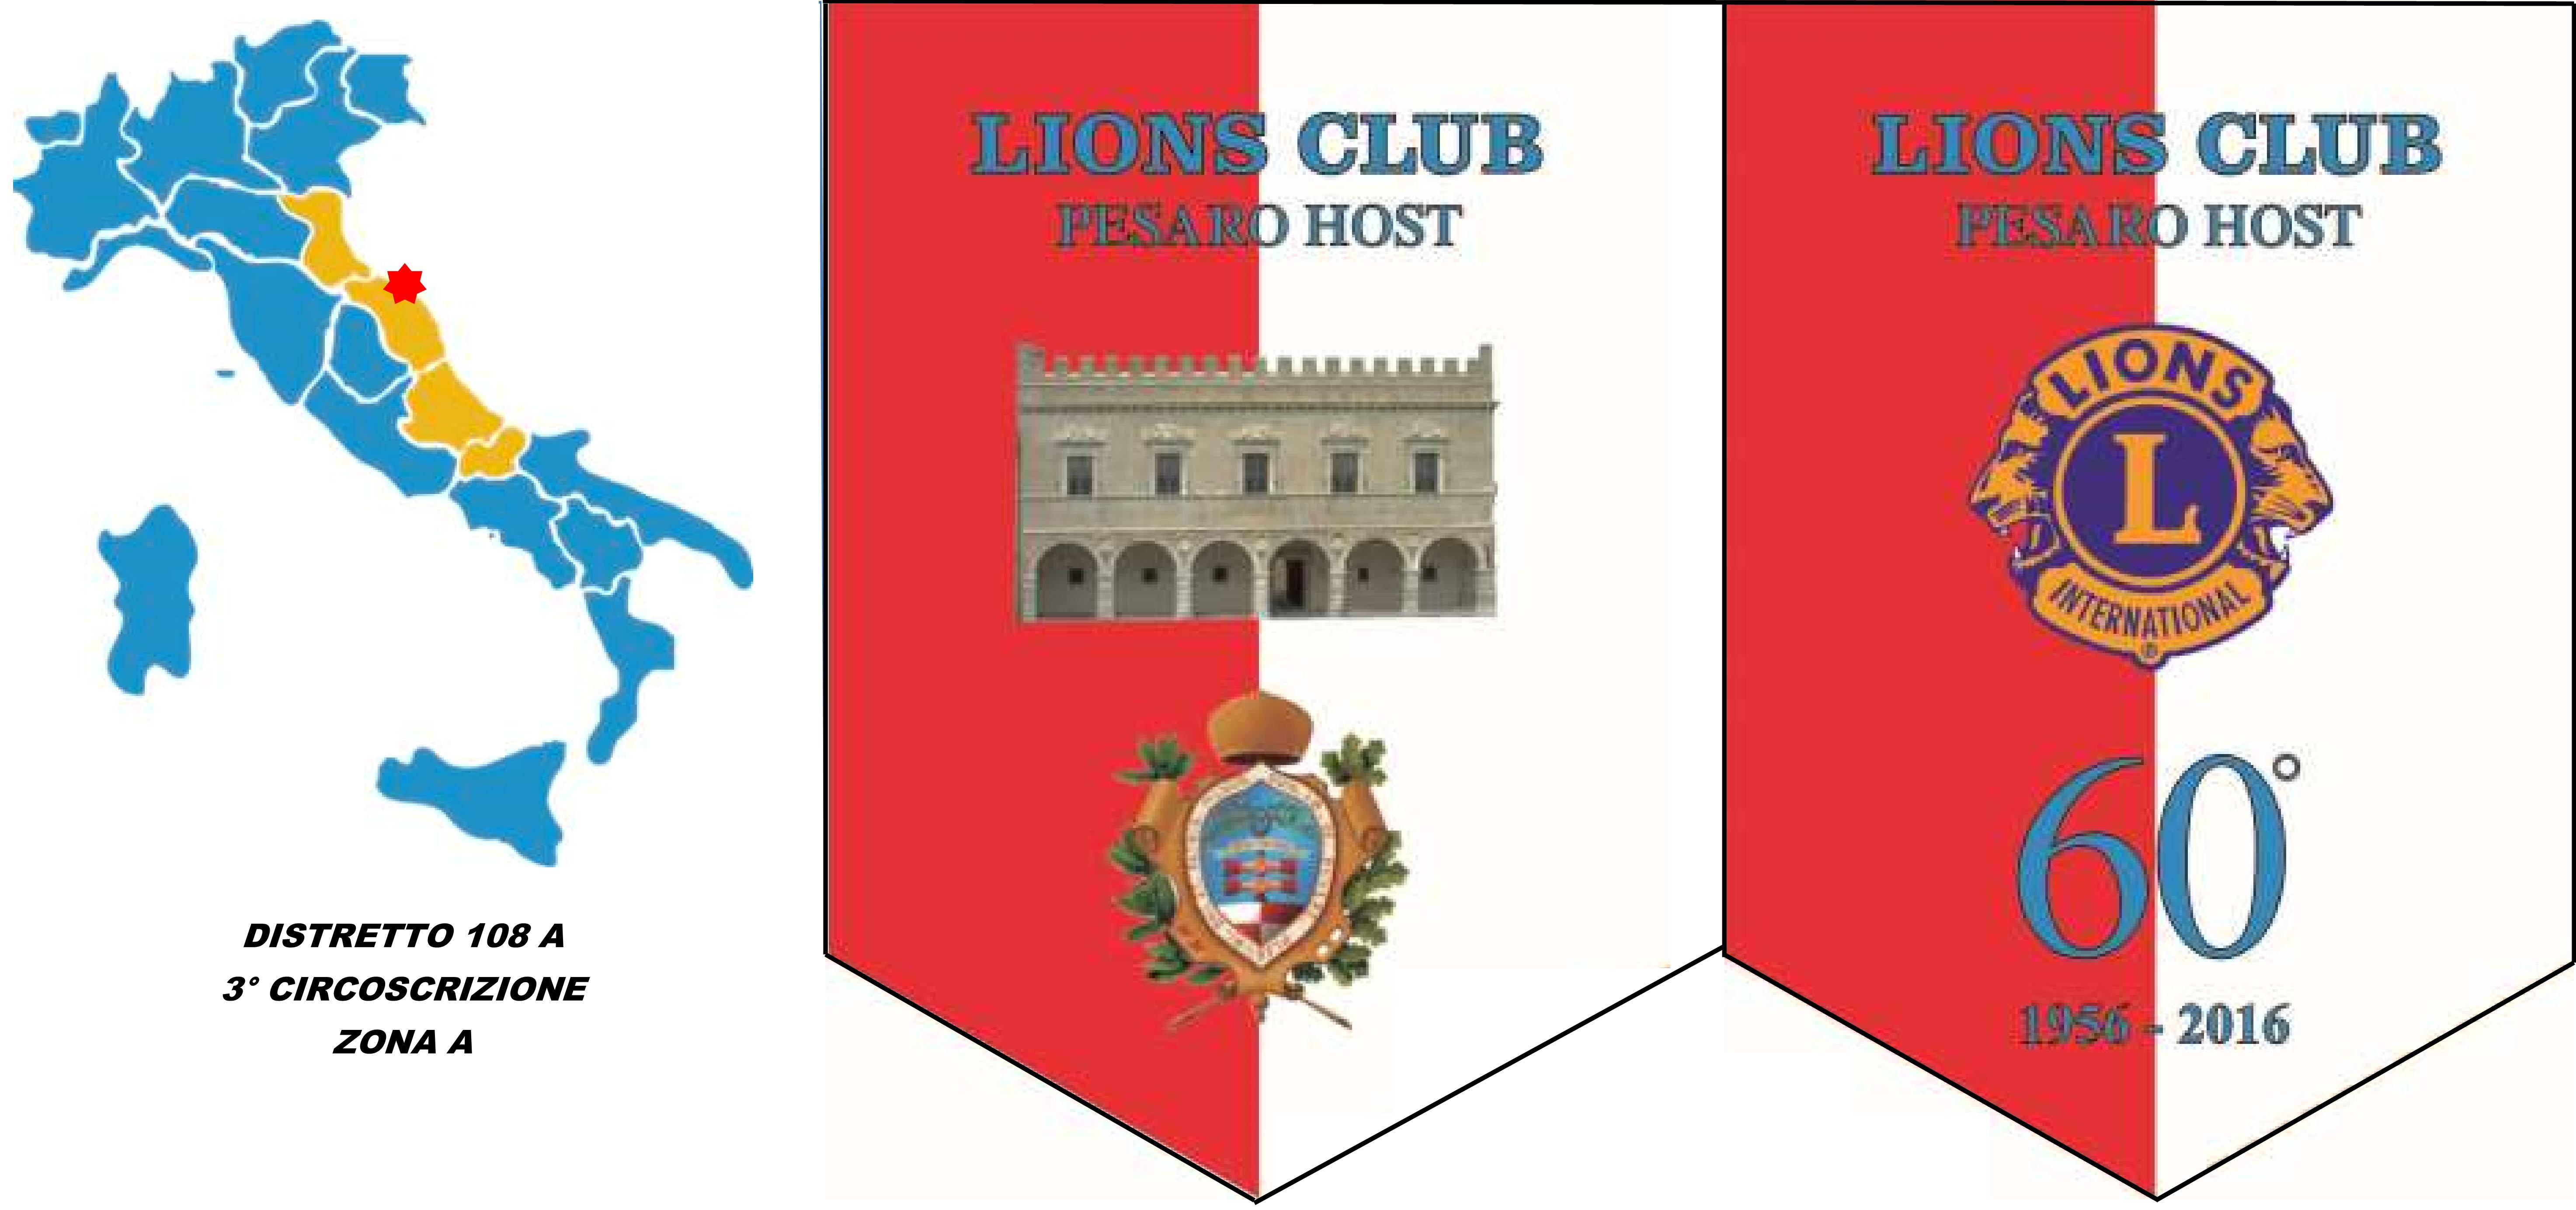 Pesaro Host